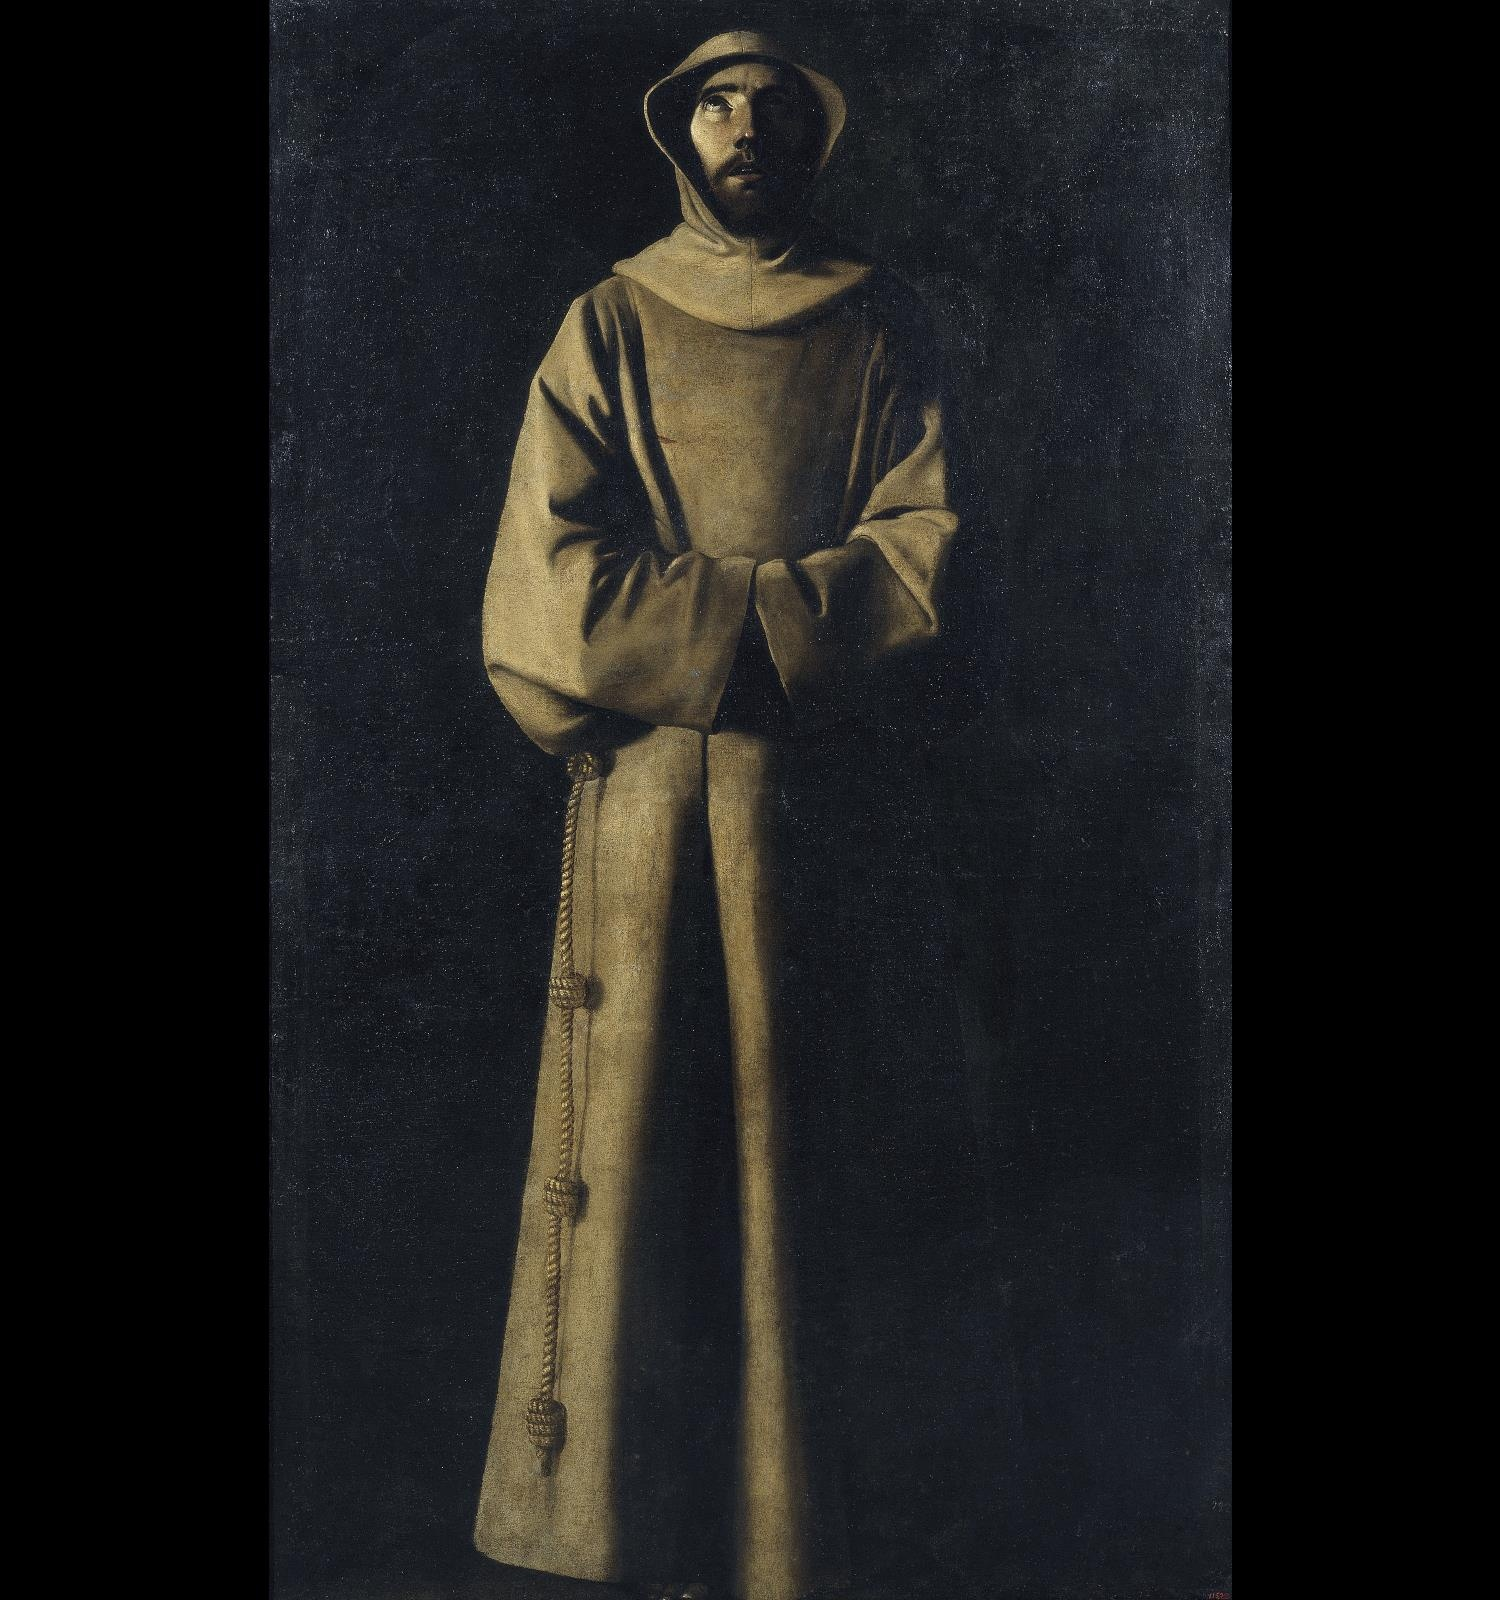 Saint Francis of Assisi according to Pope Nicholas V's Vision, Francisco de Zurbarán, circa 1640